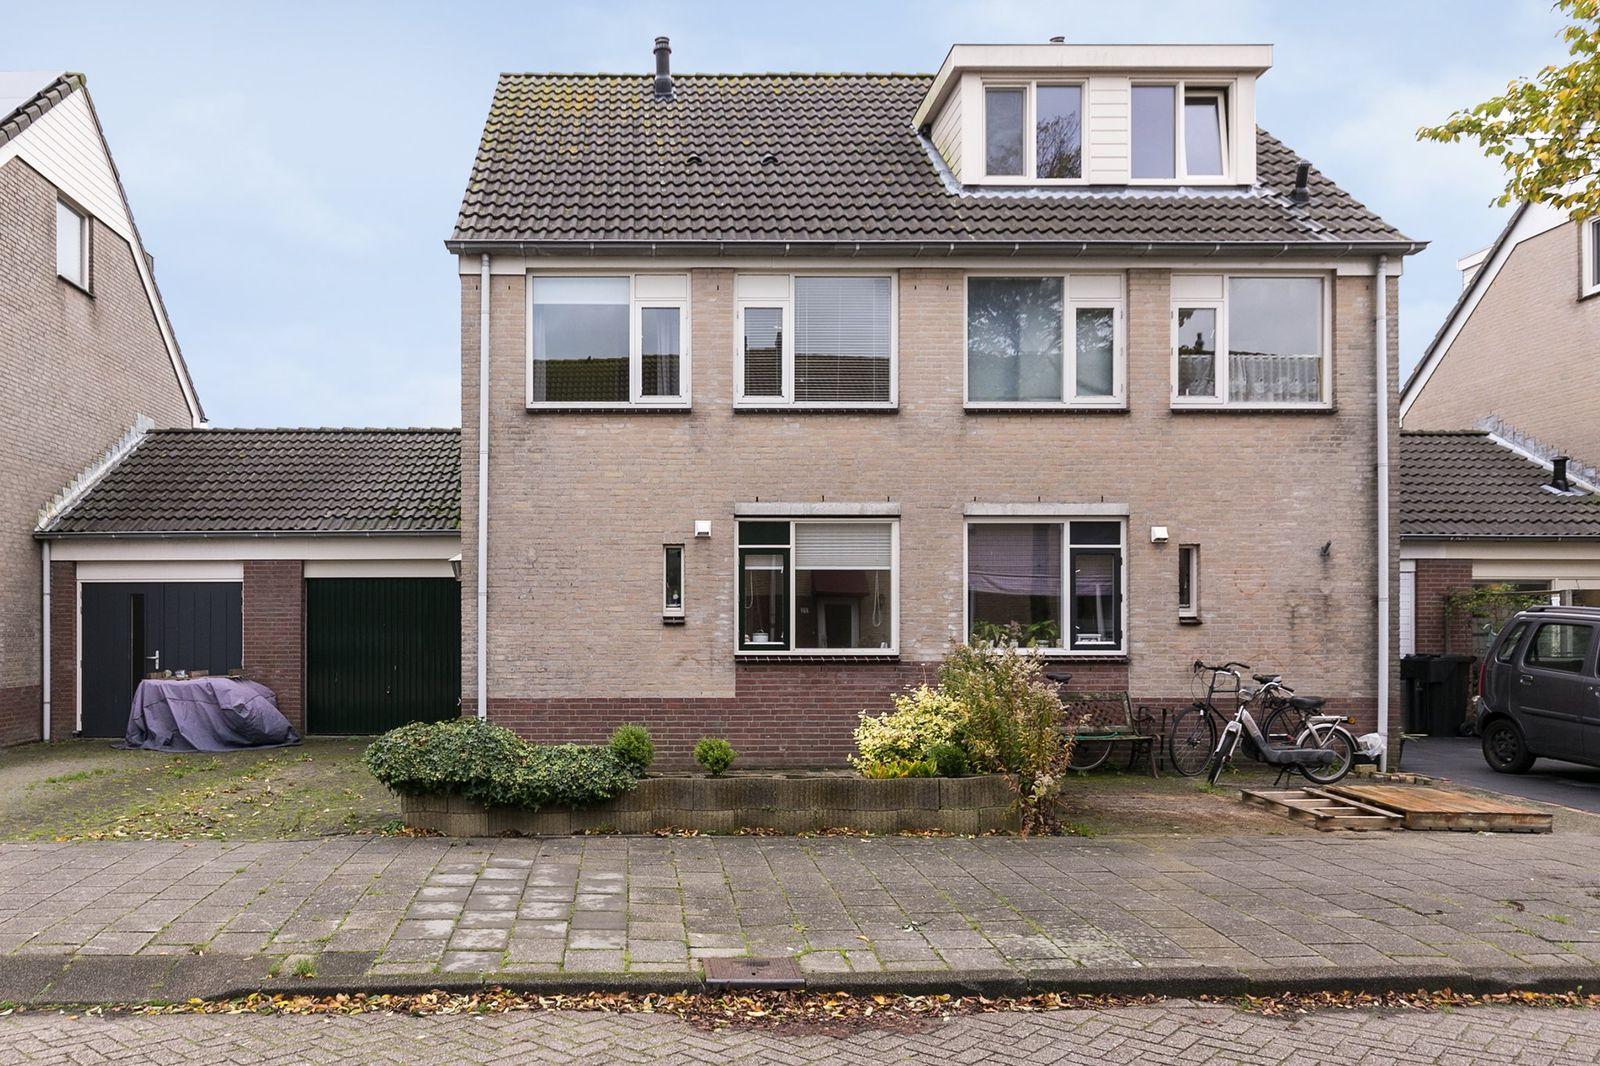 Braspenningstraat 72, Alkmaar